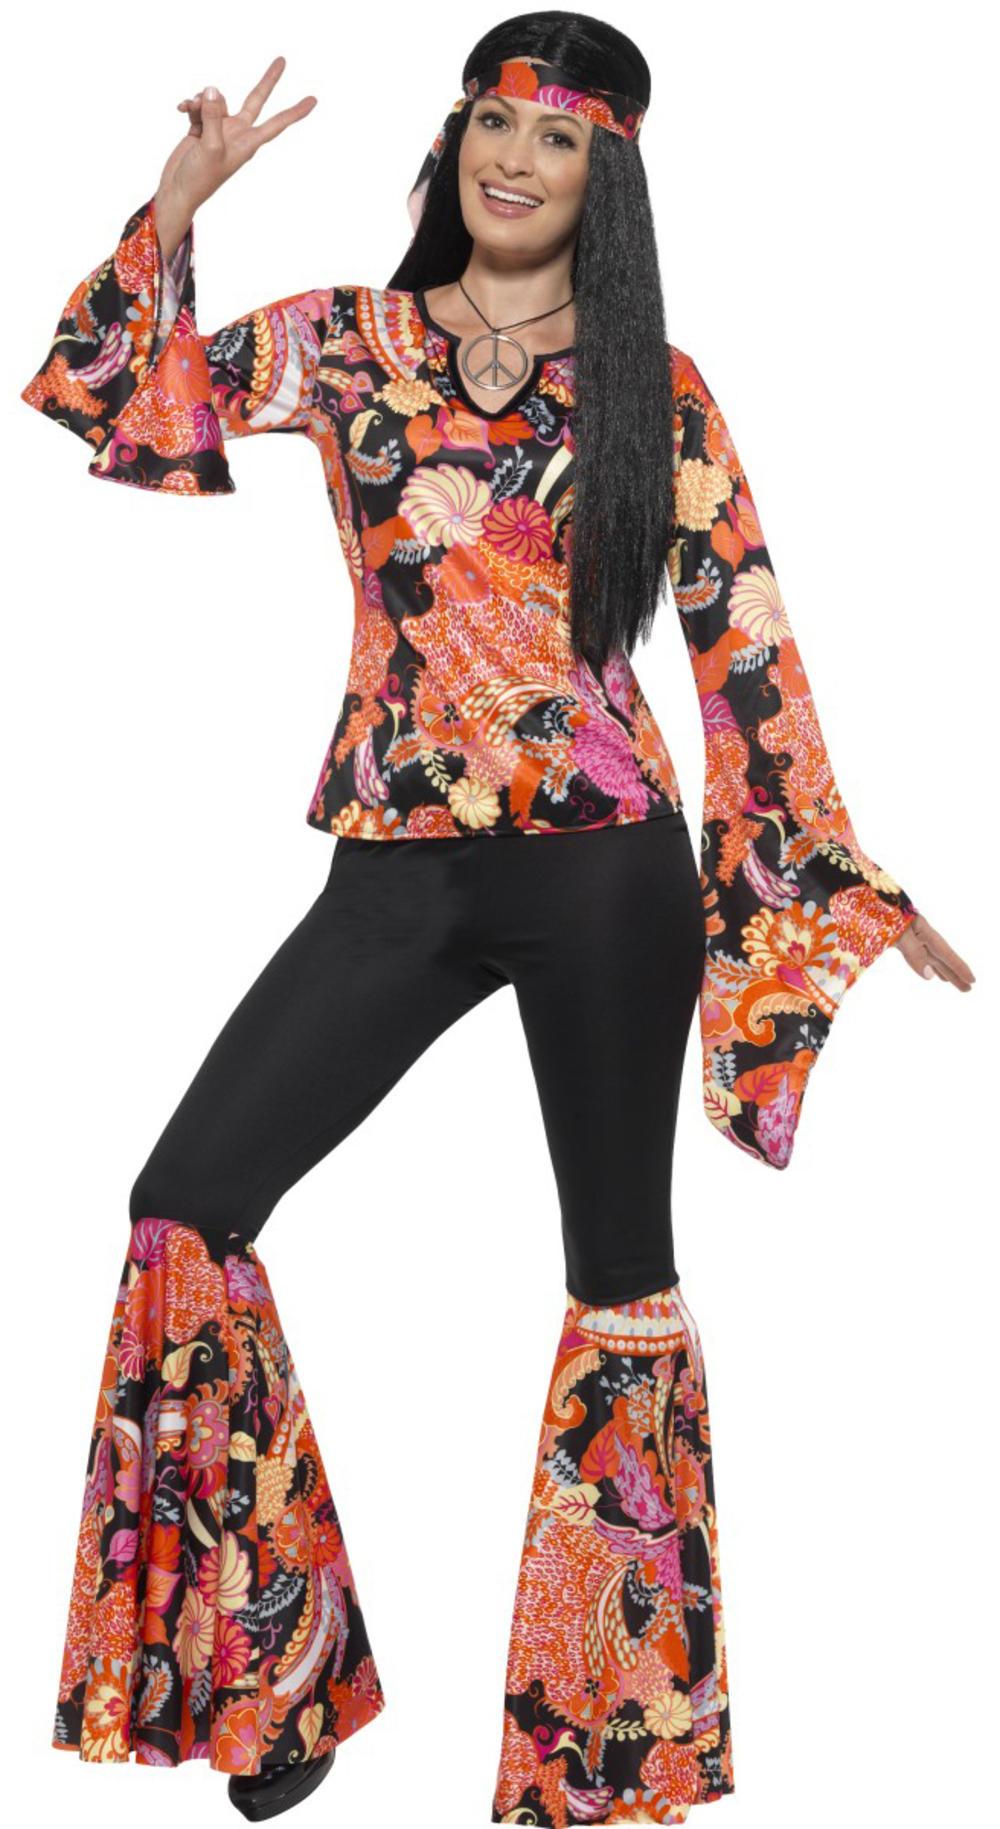 60s Hippie Ladies Fancy Dress 70s Hippy Groovy Peace Hippie Womens Adult Costume